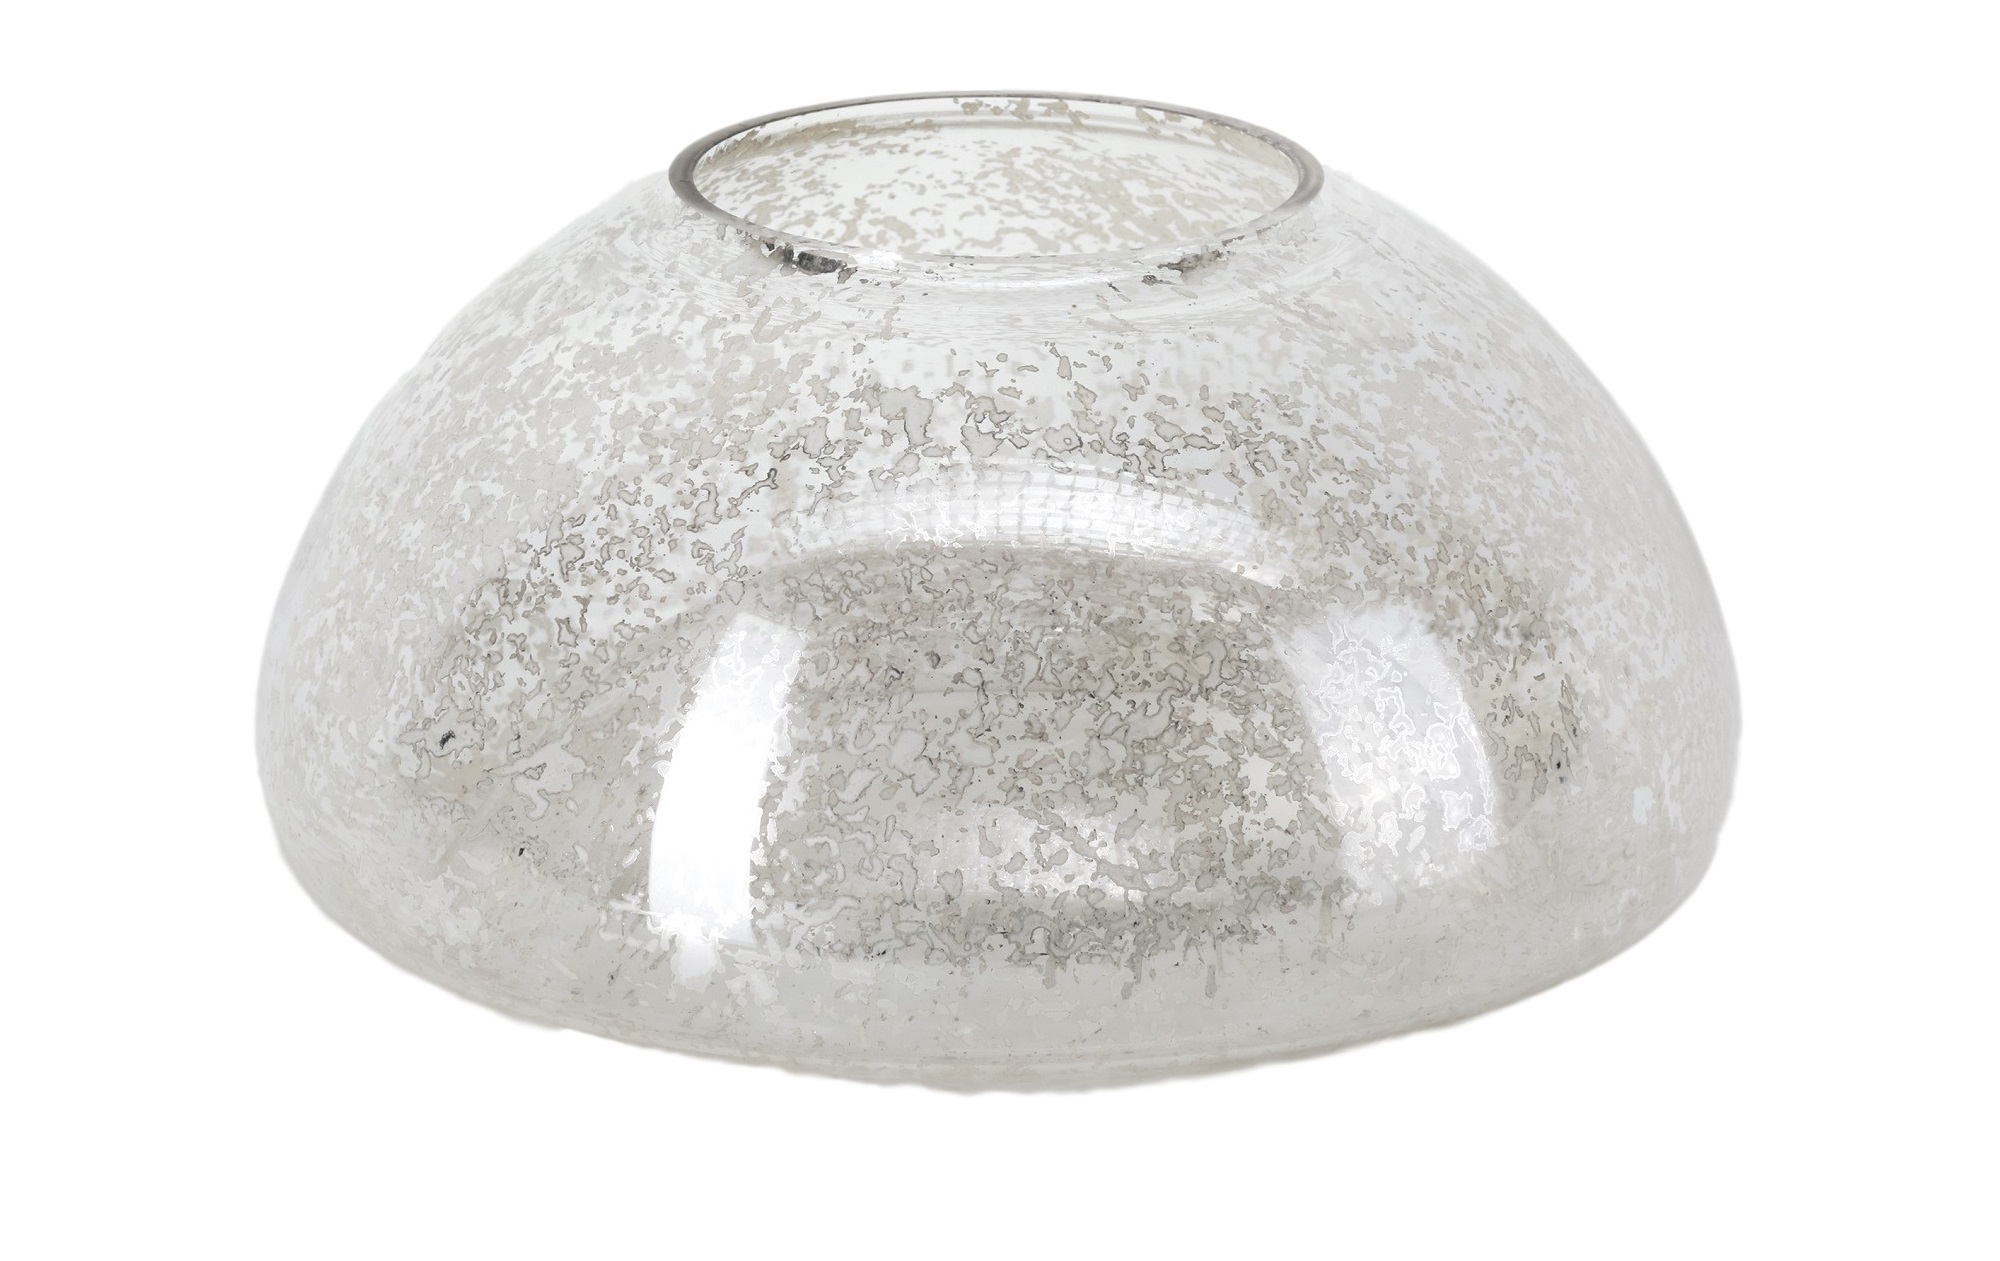 ПодсвечникПодсвечники<br>Подсвечник из стекла, декорированный в технике &amp;quot;mercury glass&amp;quot;<br><br>Material: Стекло<br>Height см: 13<br>Diameter см: 25